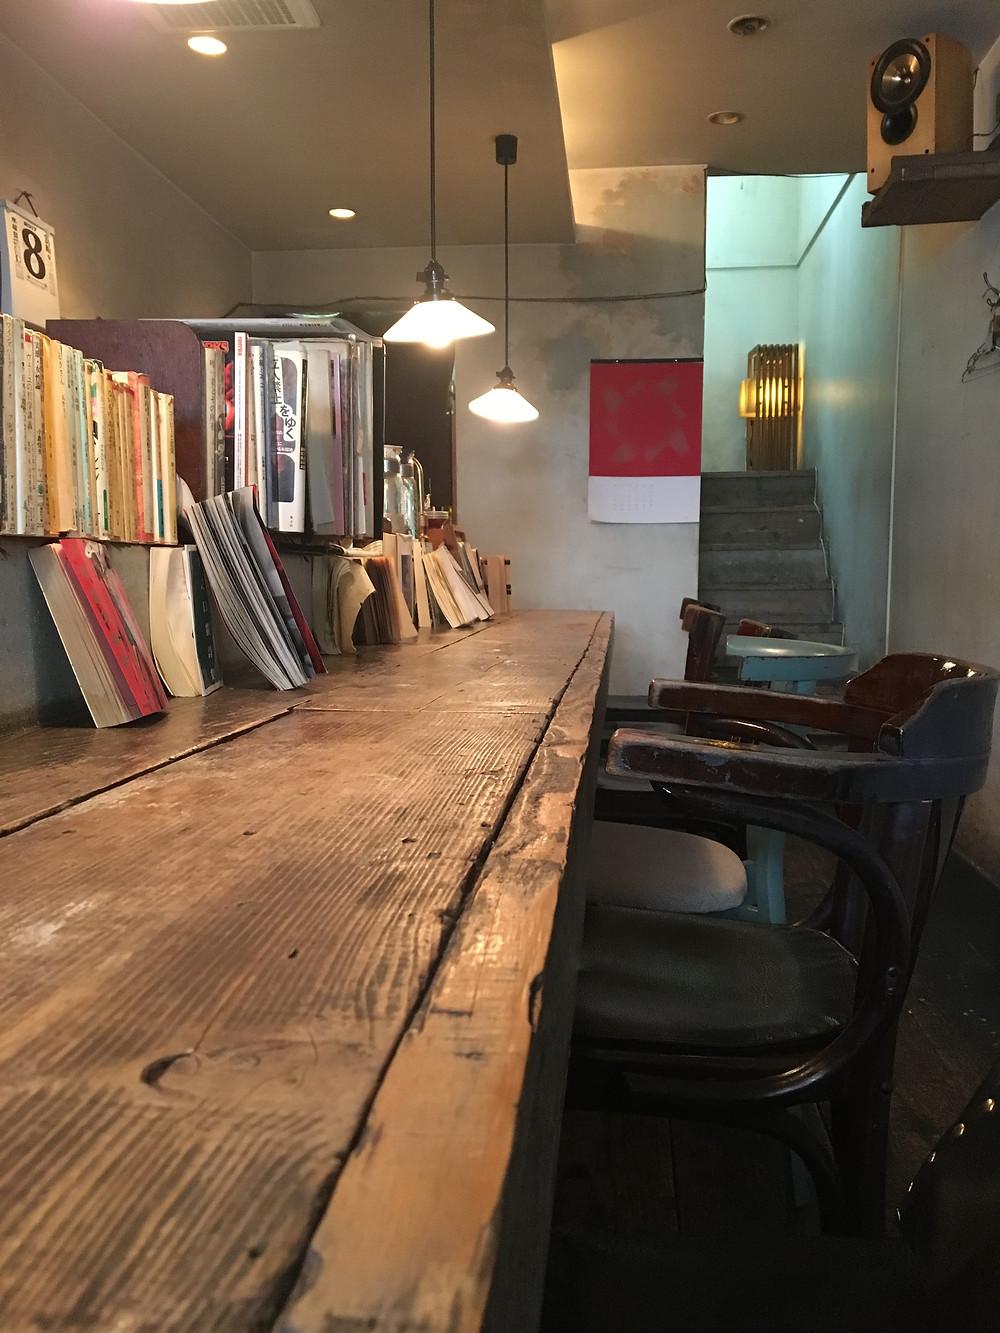 tokyo,restaurant,nishiogikubo,nishiogi,factoria